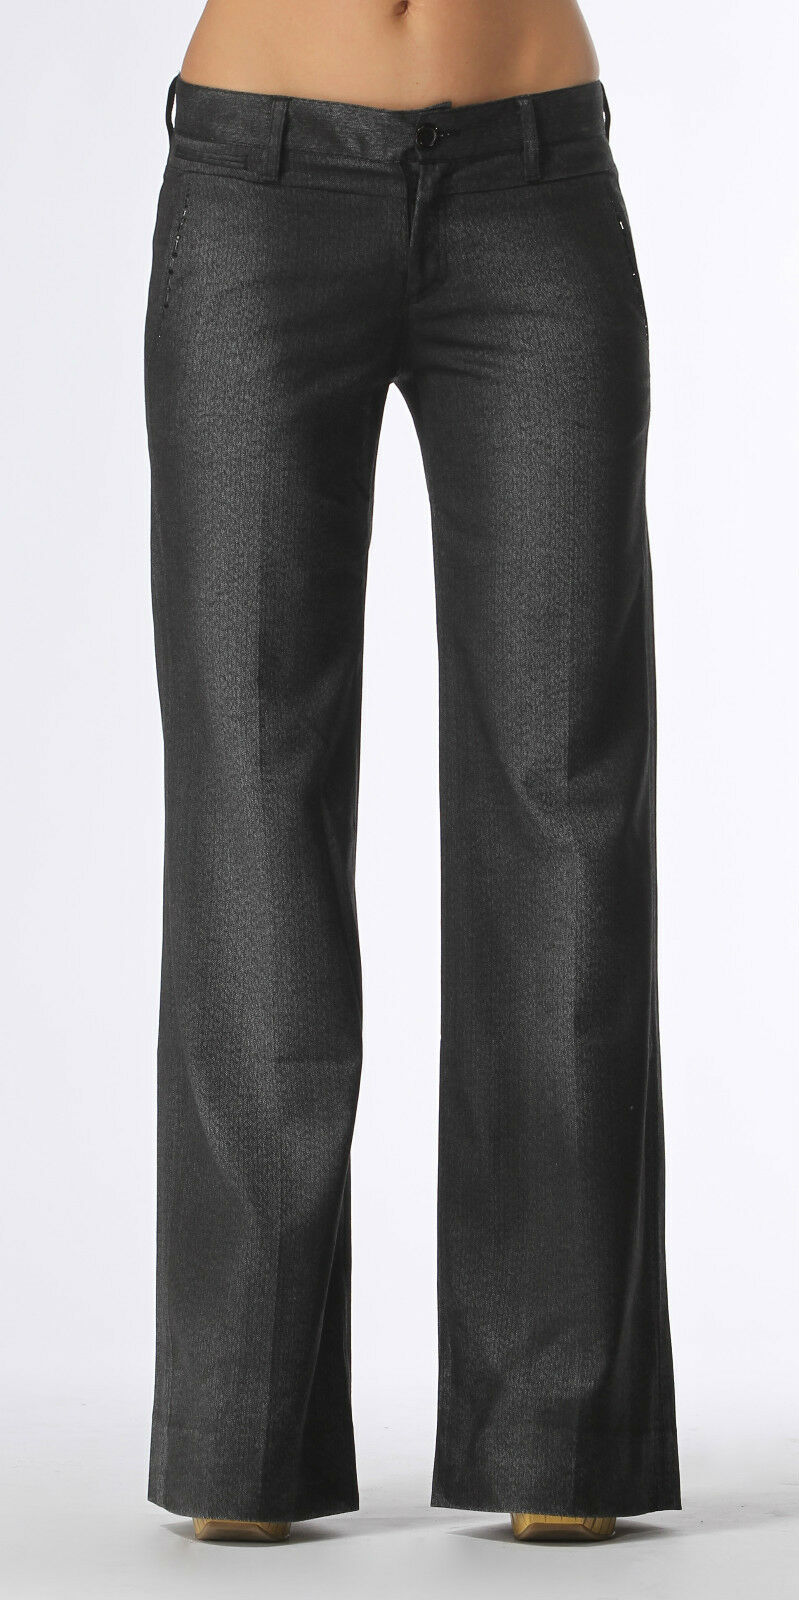 Beaded Grey Wide Leg Pants 24 28 29 30 31 NWT